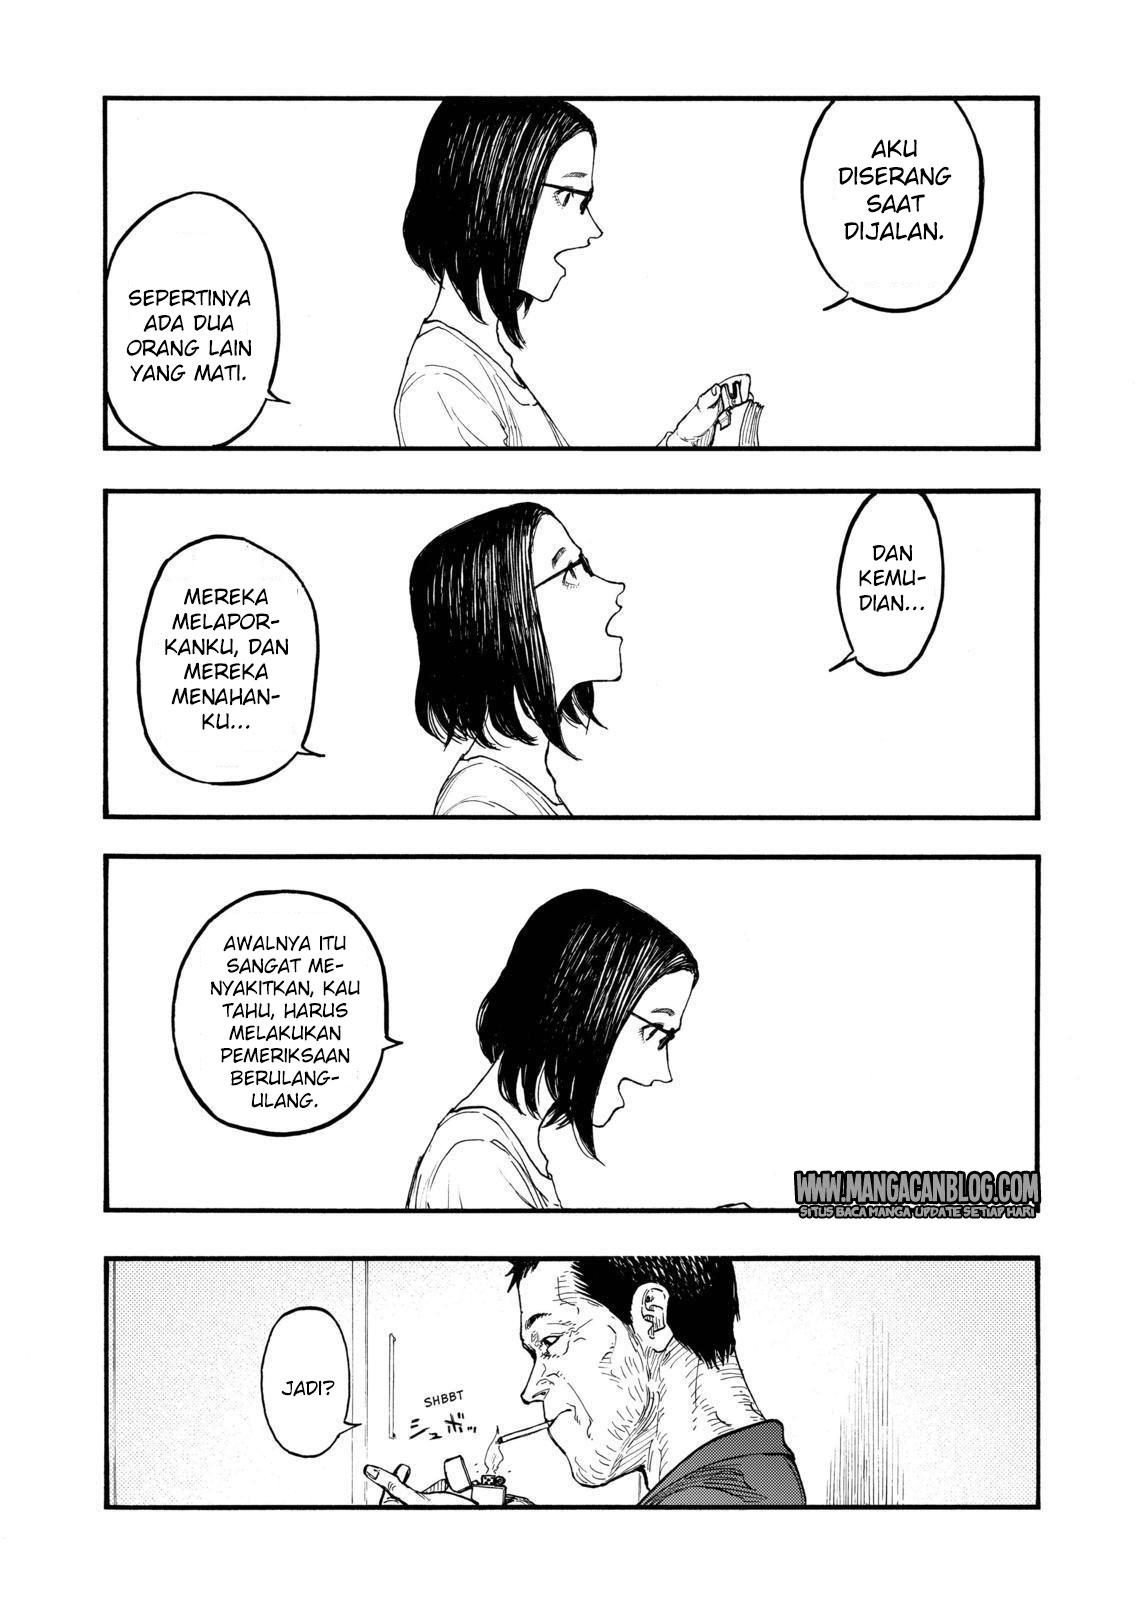 Dilarang COPAS - situs resmi www.mangacanblog.com - Komik ajin 046 - selamat pagi, sampai jumpa besok 47 Indonesia ajin 046 - selamat pagi, sampai jumpa besok Terbaru 33|Baca Manga Komik Indonesia|Mangacan